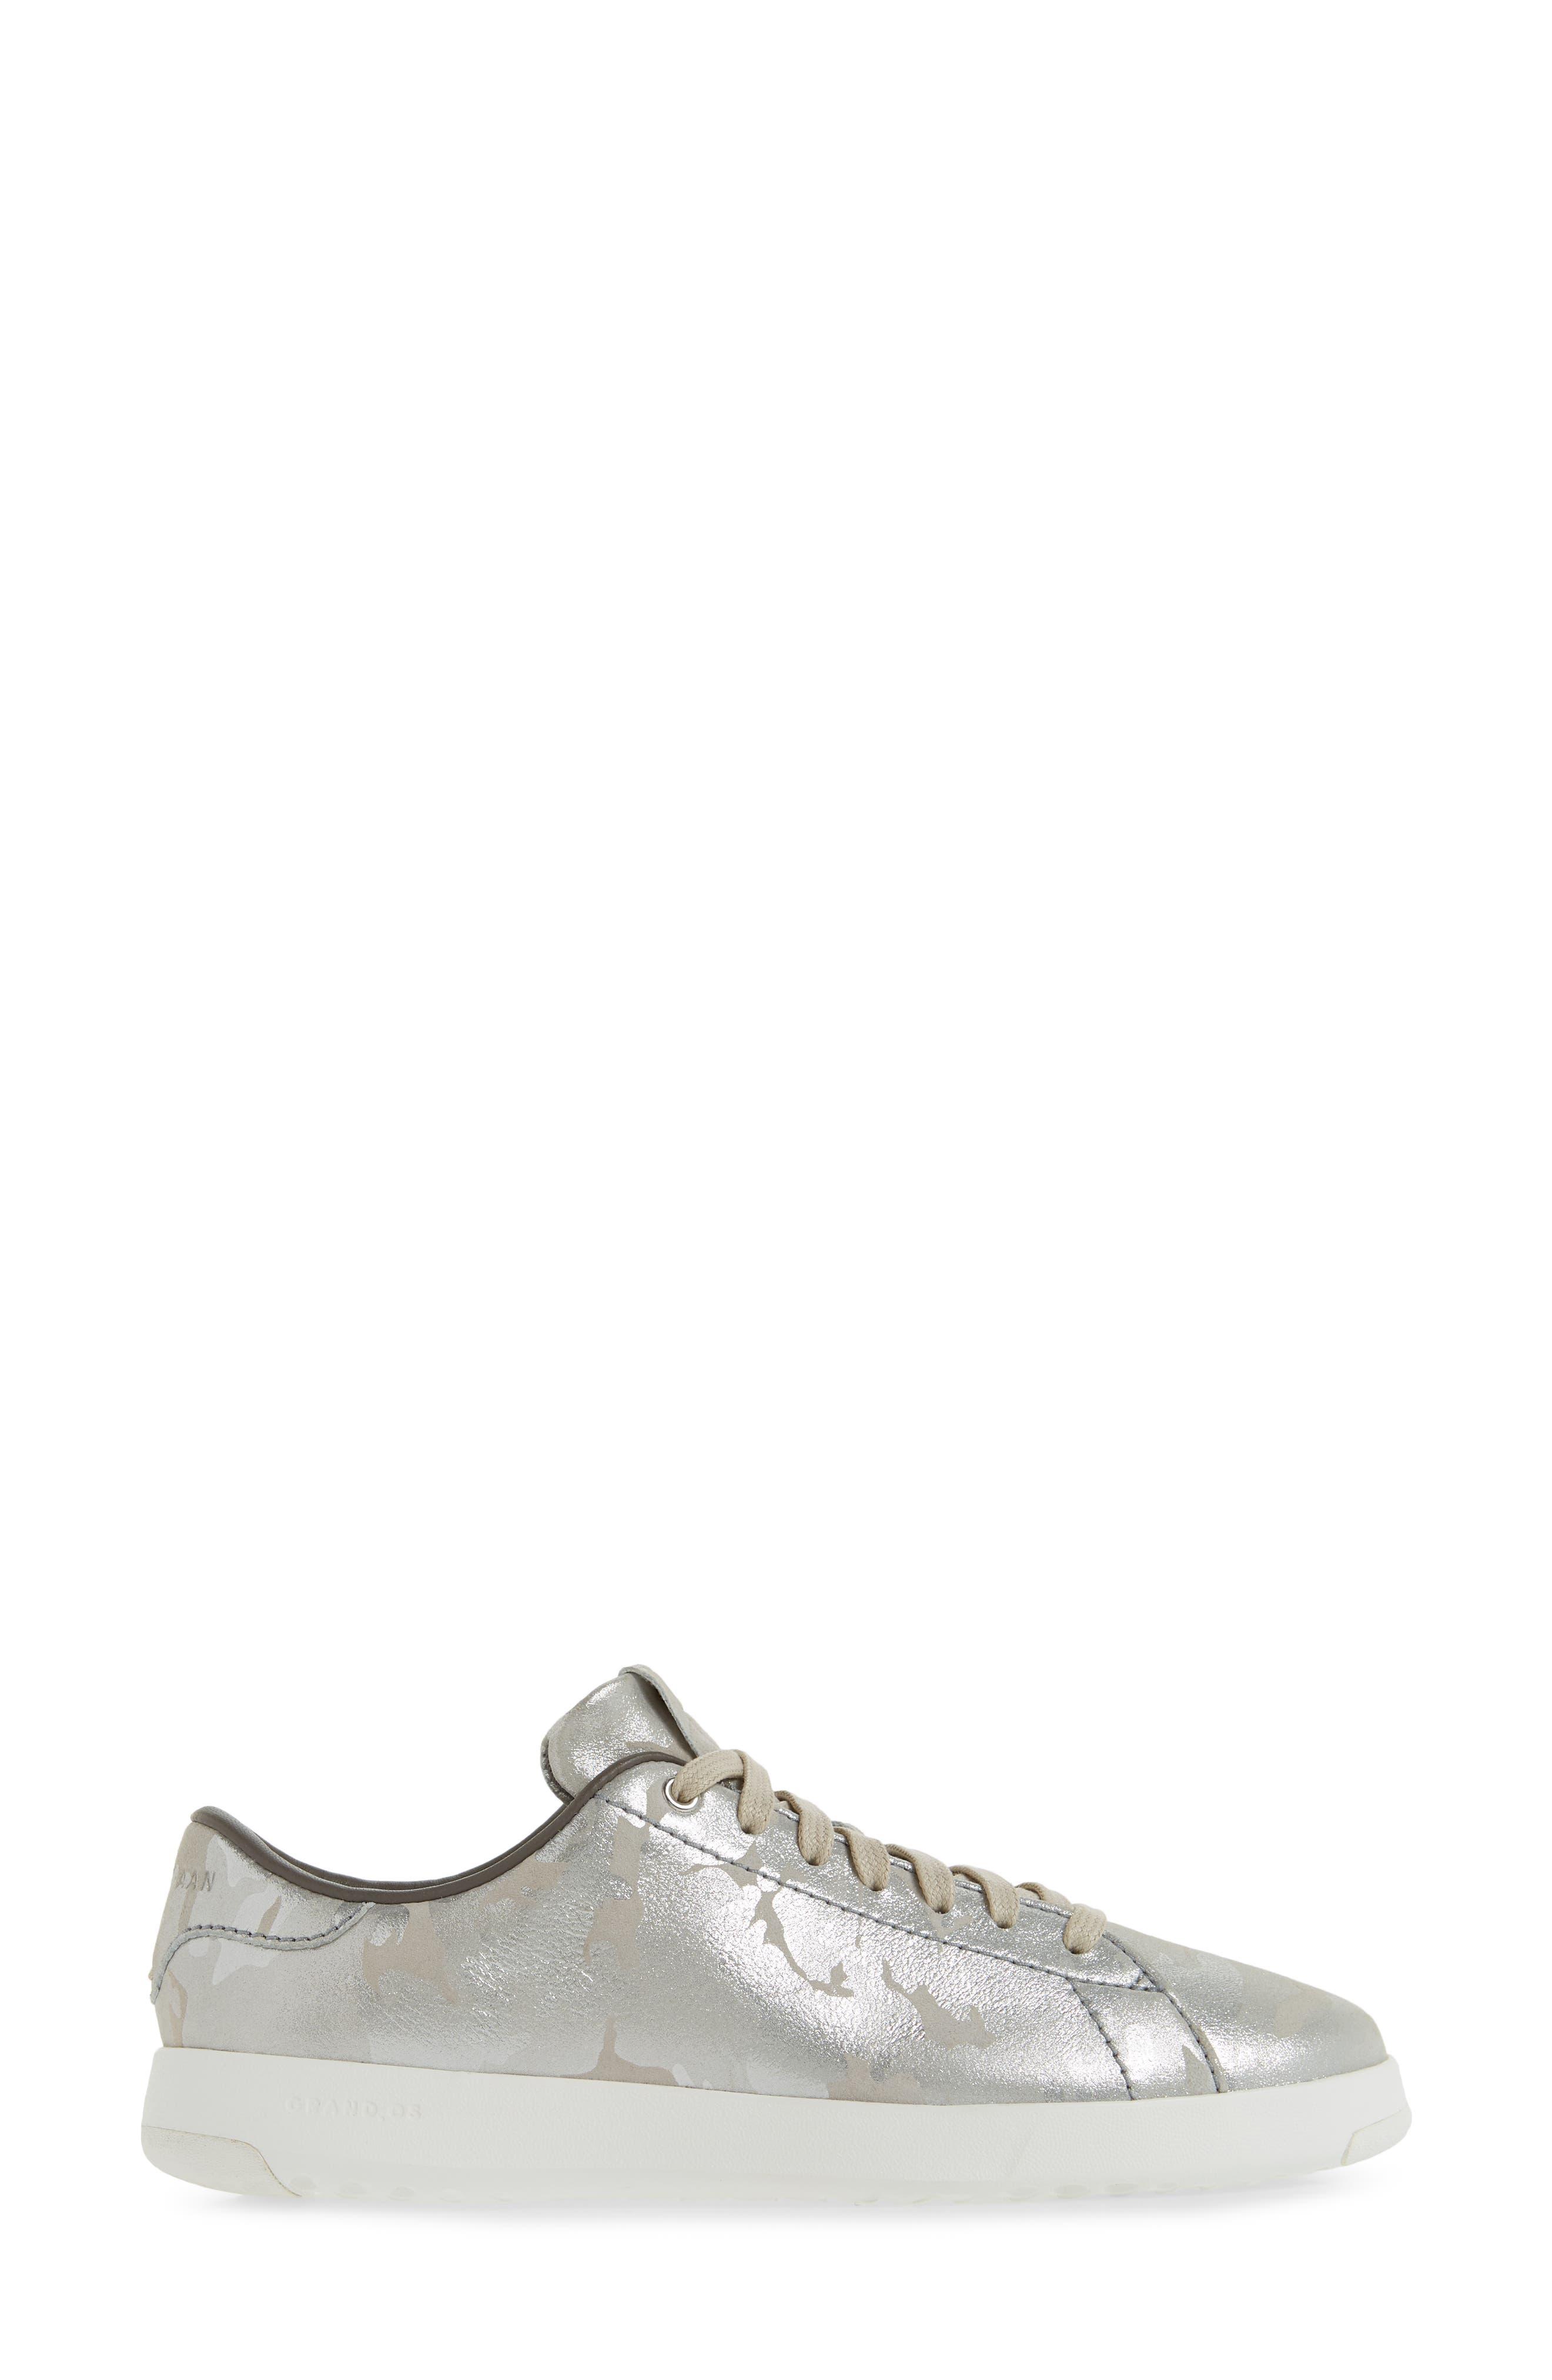 GrandPro Tennis Shoe,                             Alternate thumbnail 3, color,                             Dove Metallic Camo Leather